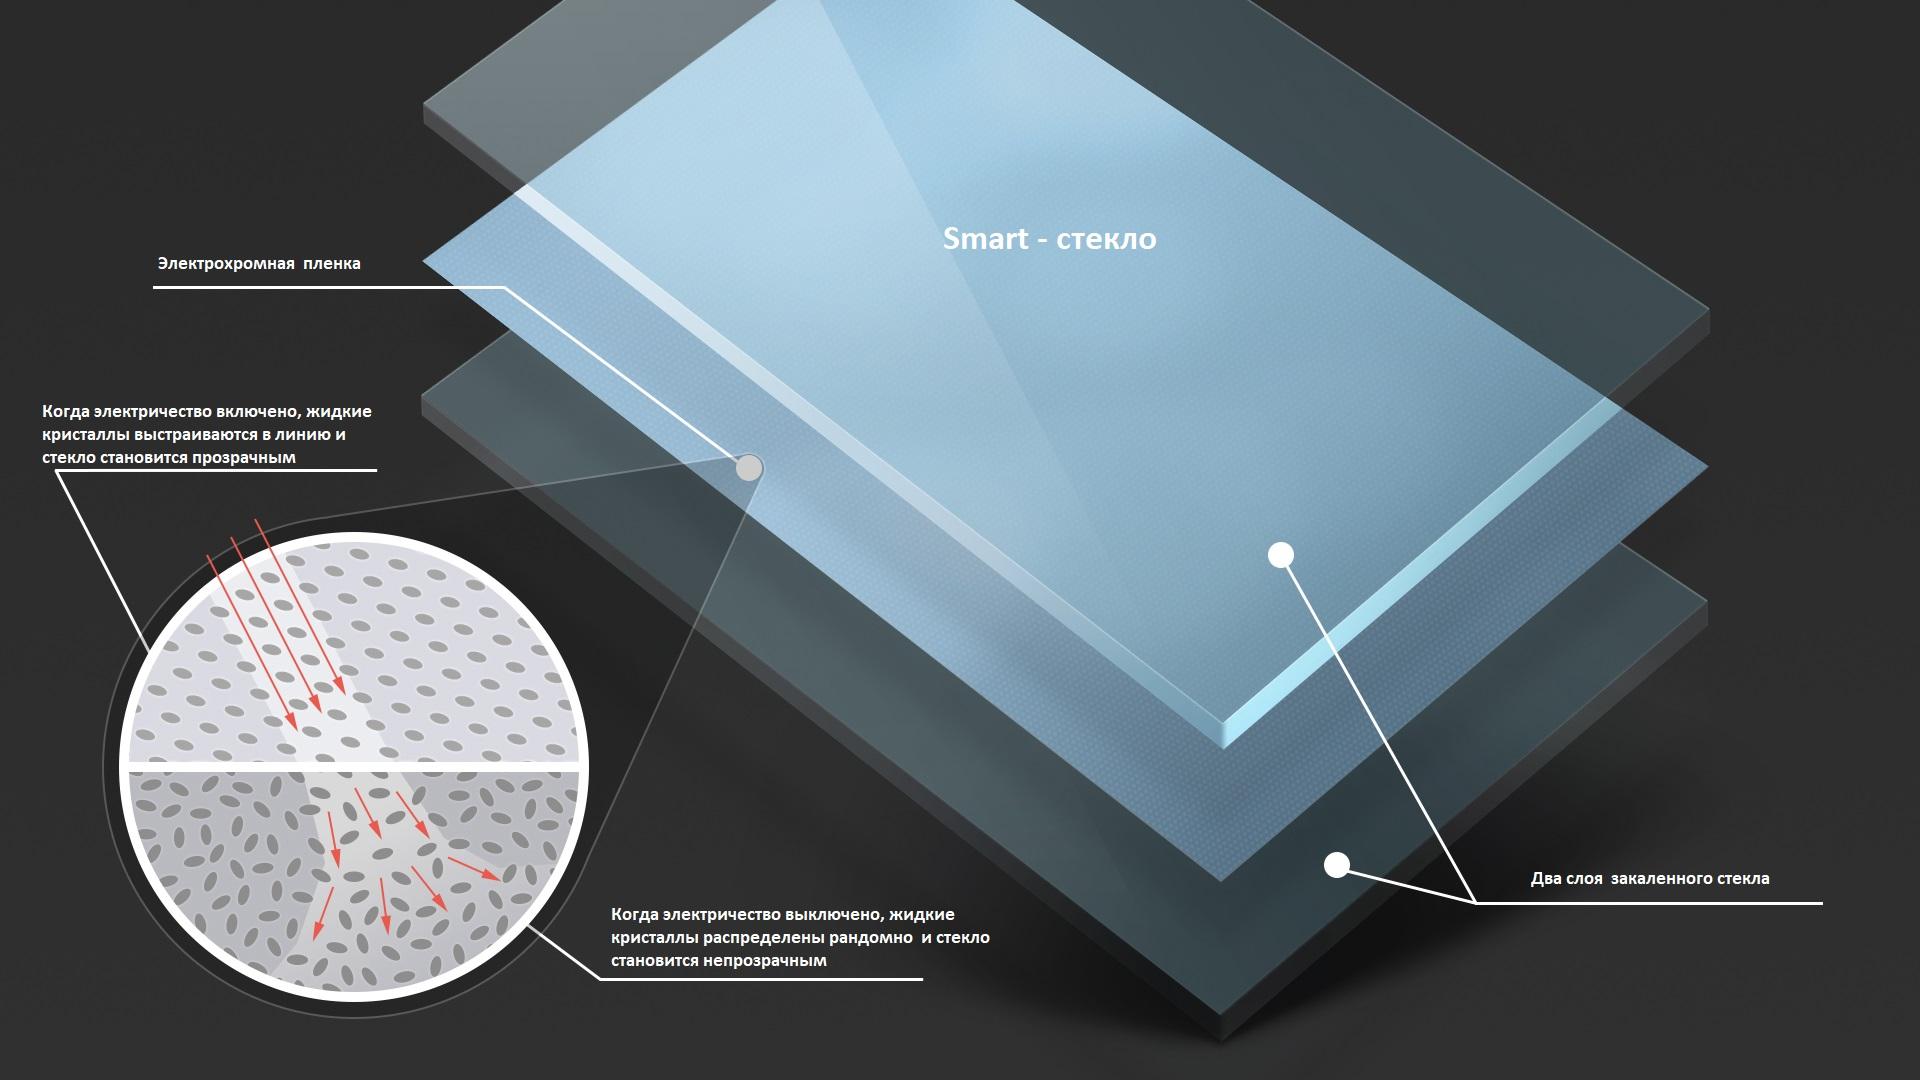 Smart glass manufacturer: functions, advantages, applications